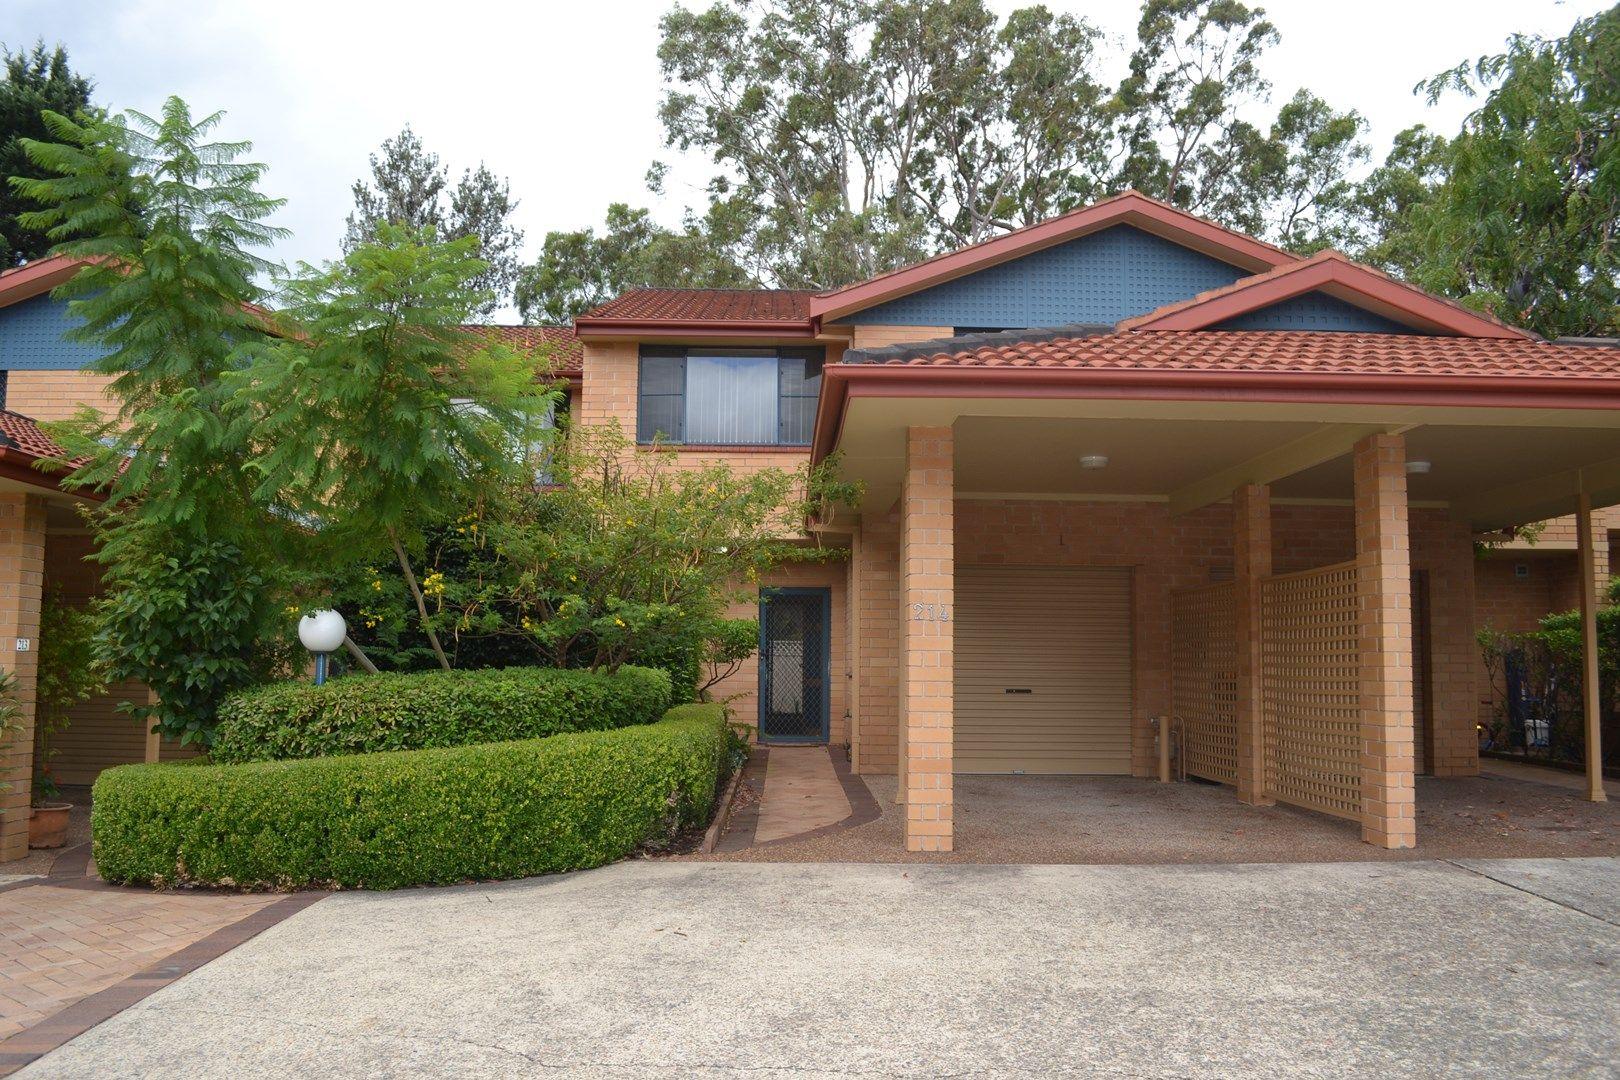 214/1-15 Fontenoy Road, Macquarie Park NSW 2113, Image 0